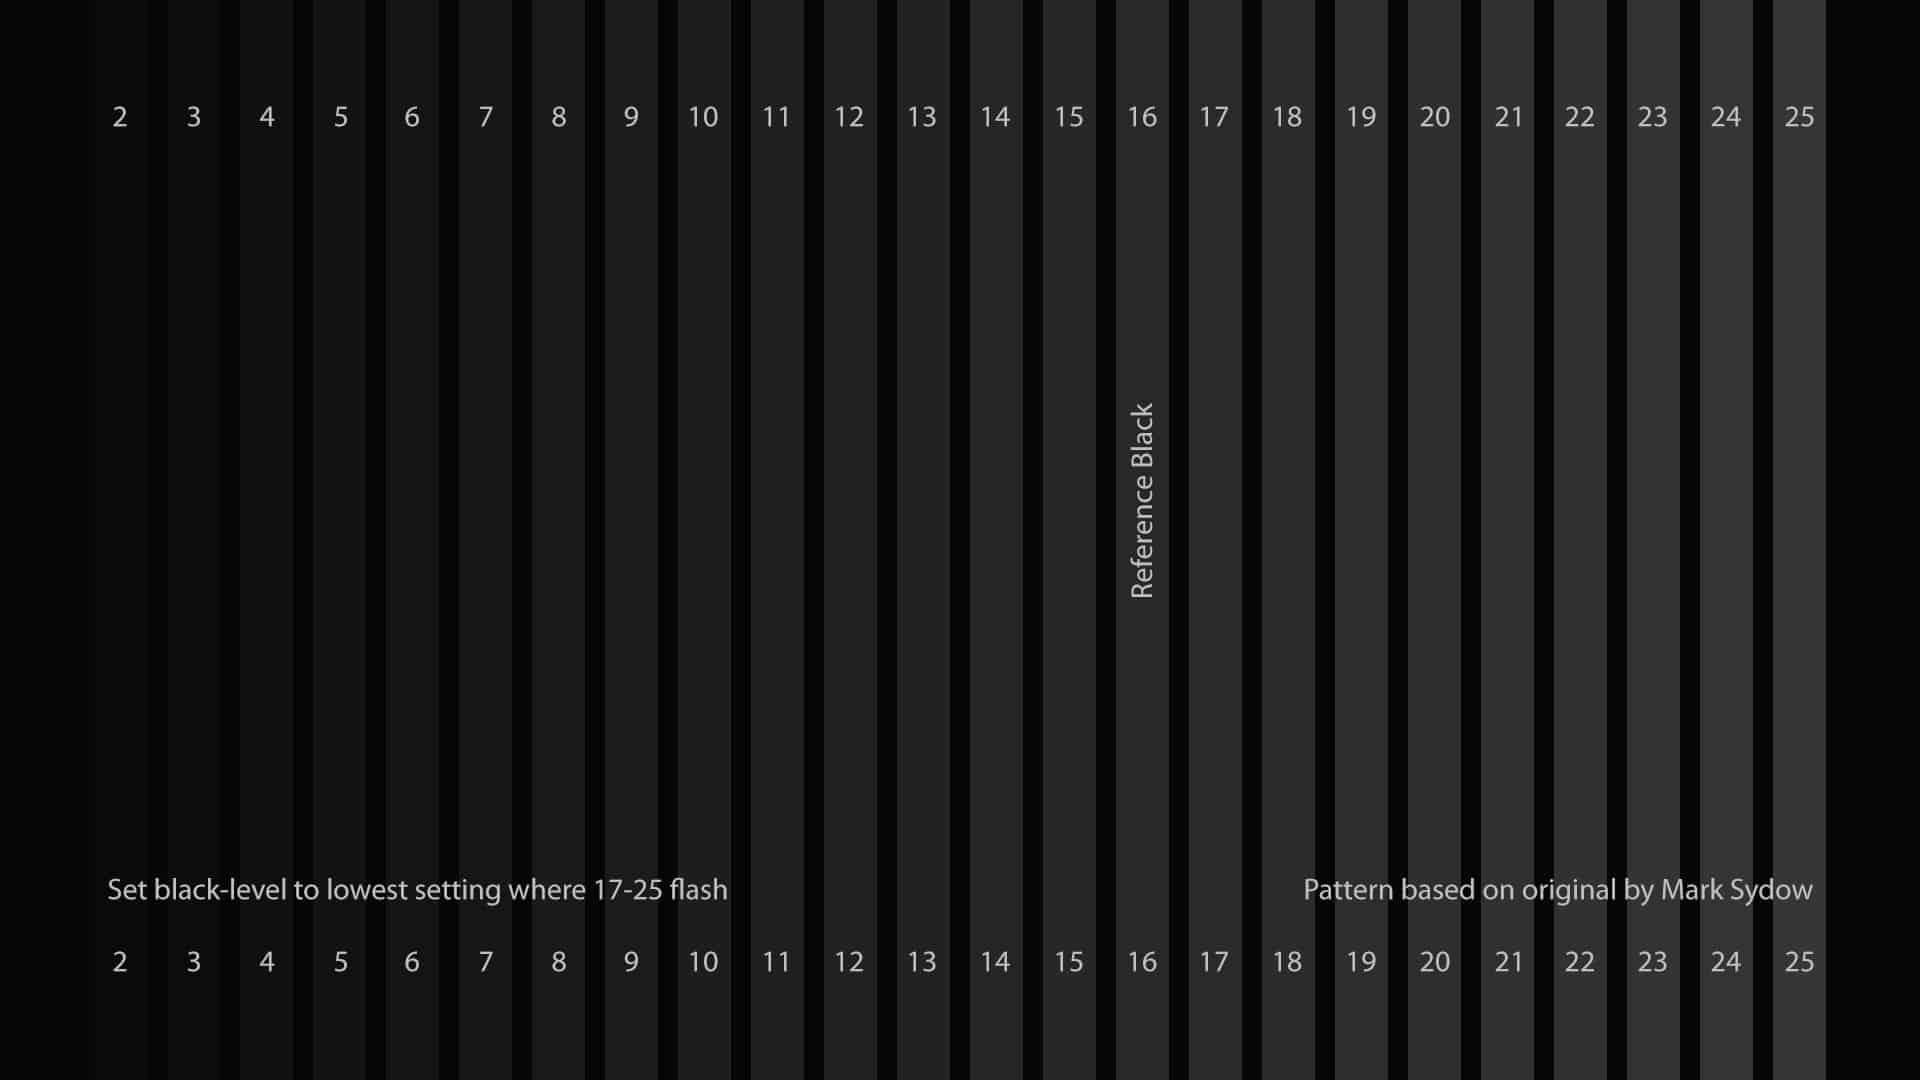 Plex/Netflix -> Chromecast -> Denon avr-x3200w - > epson